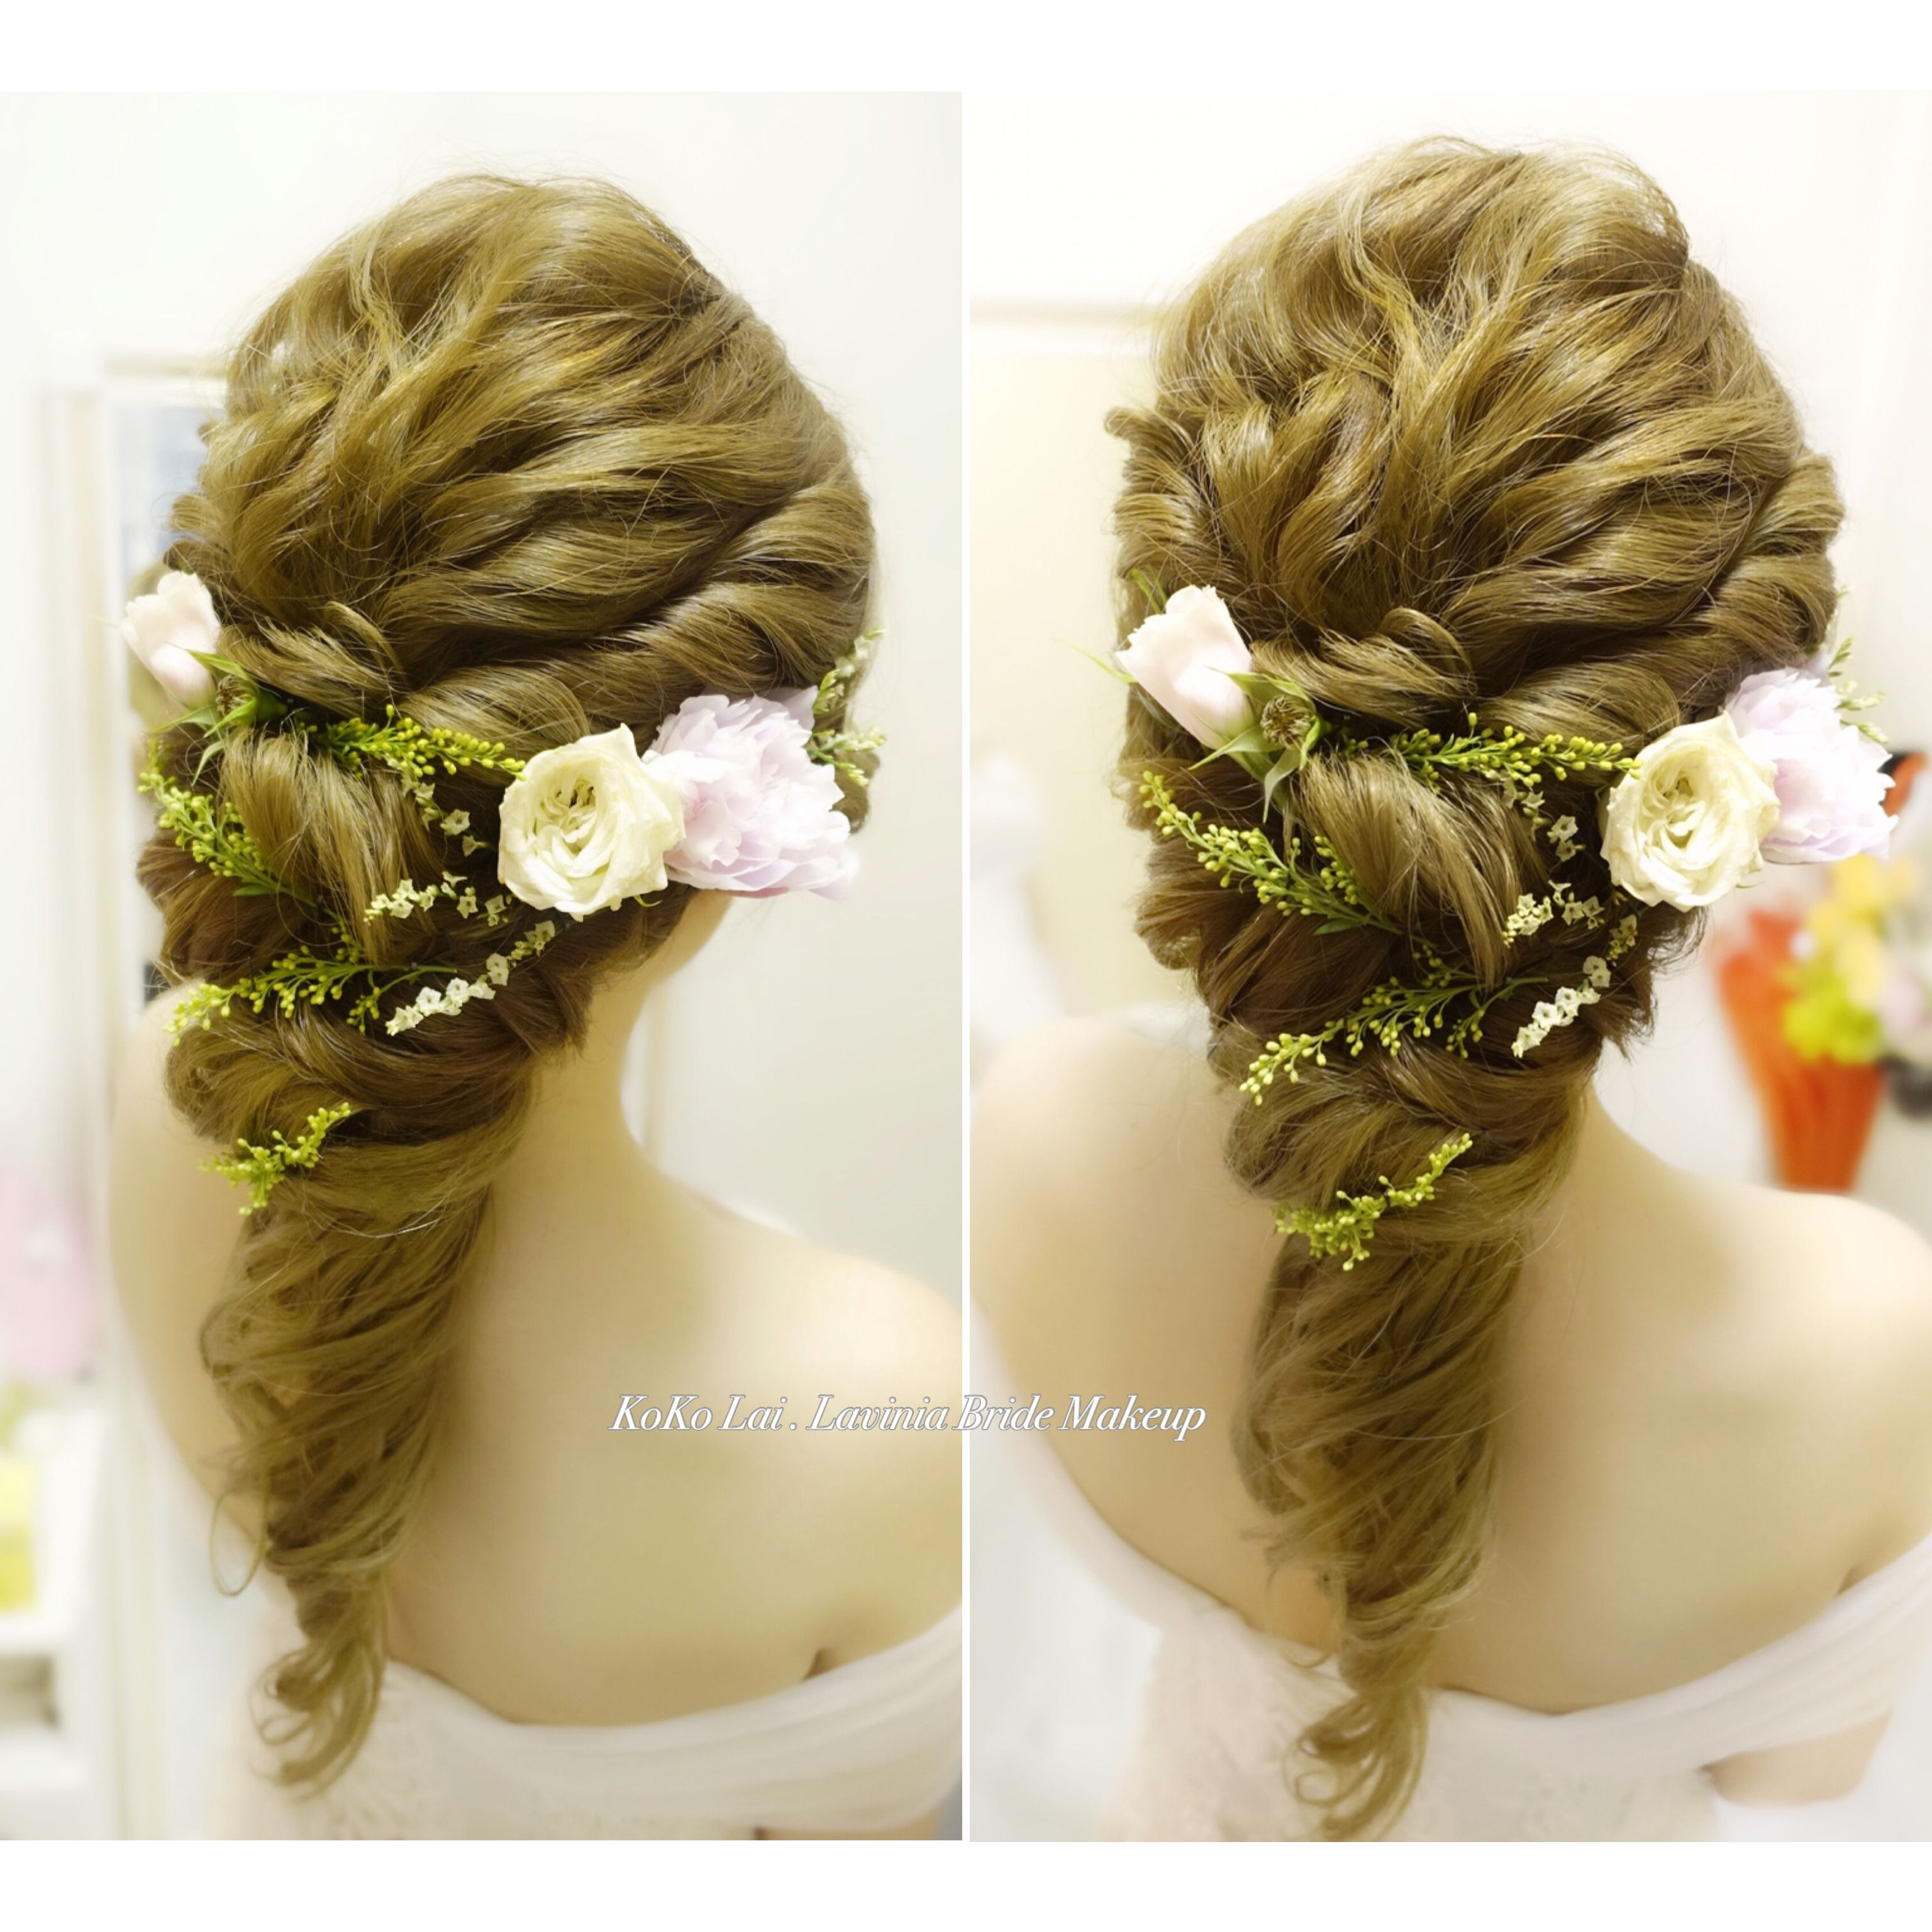 Desktop diy wedding hair up of hairstyles long computer hd pin by koko lai on makeup